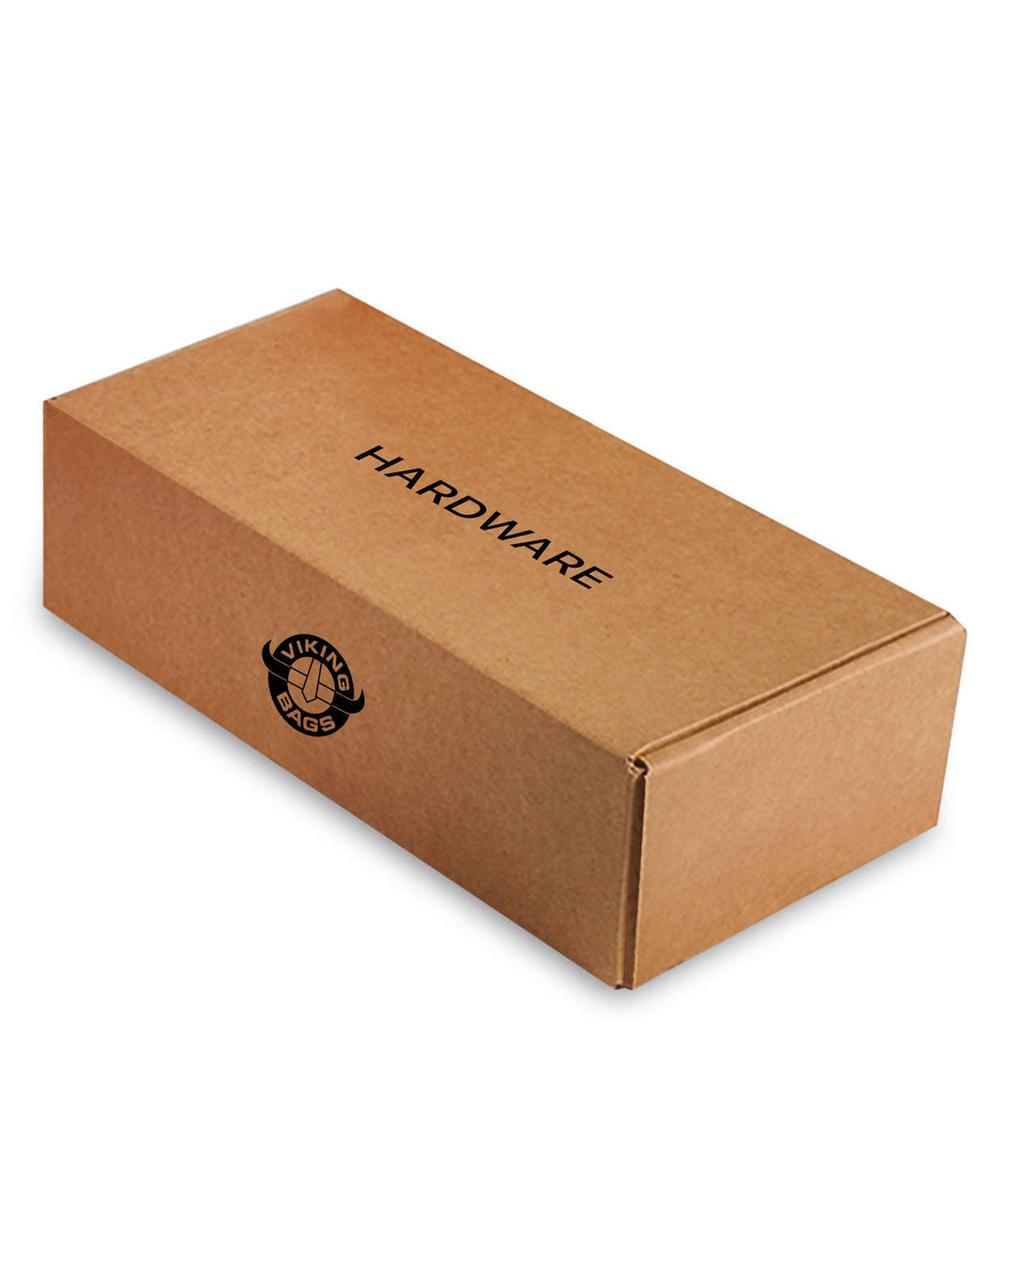 Triumph Thunderbird Warrior Shock Cutout Large Motorcycle Saddlebags Box